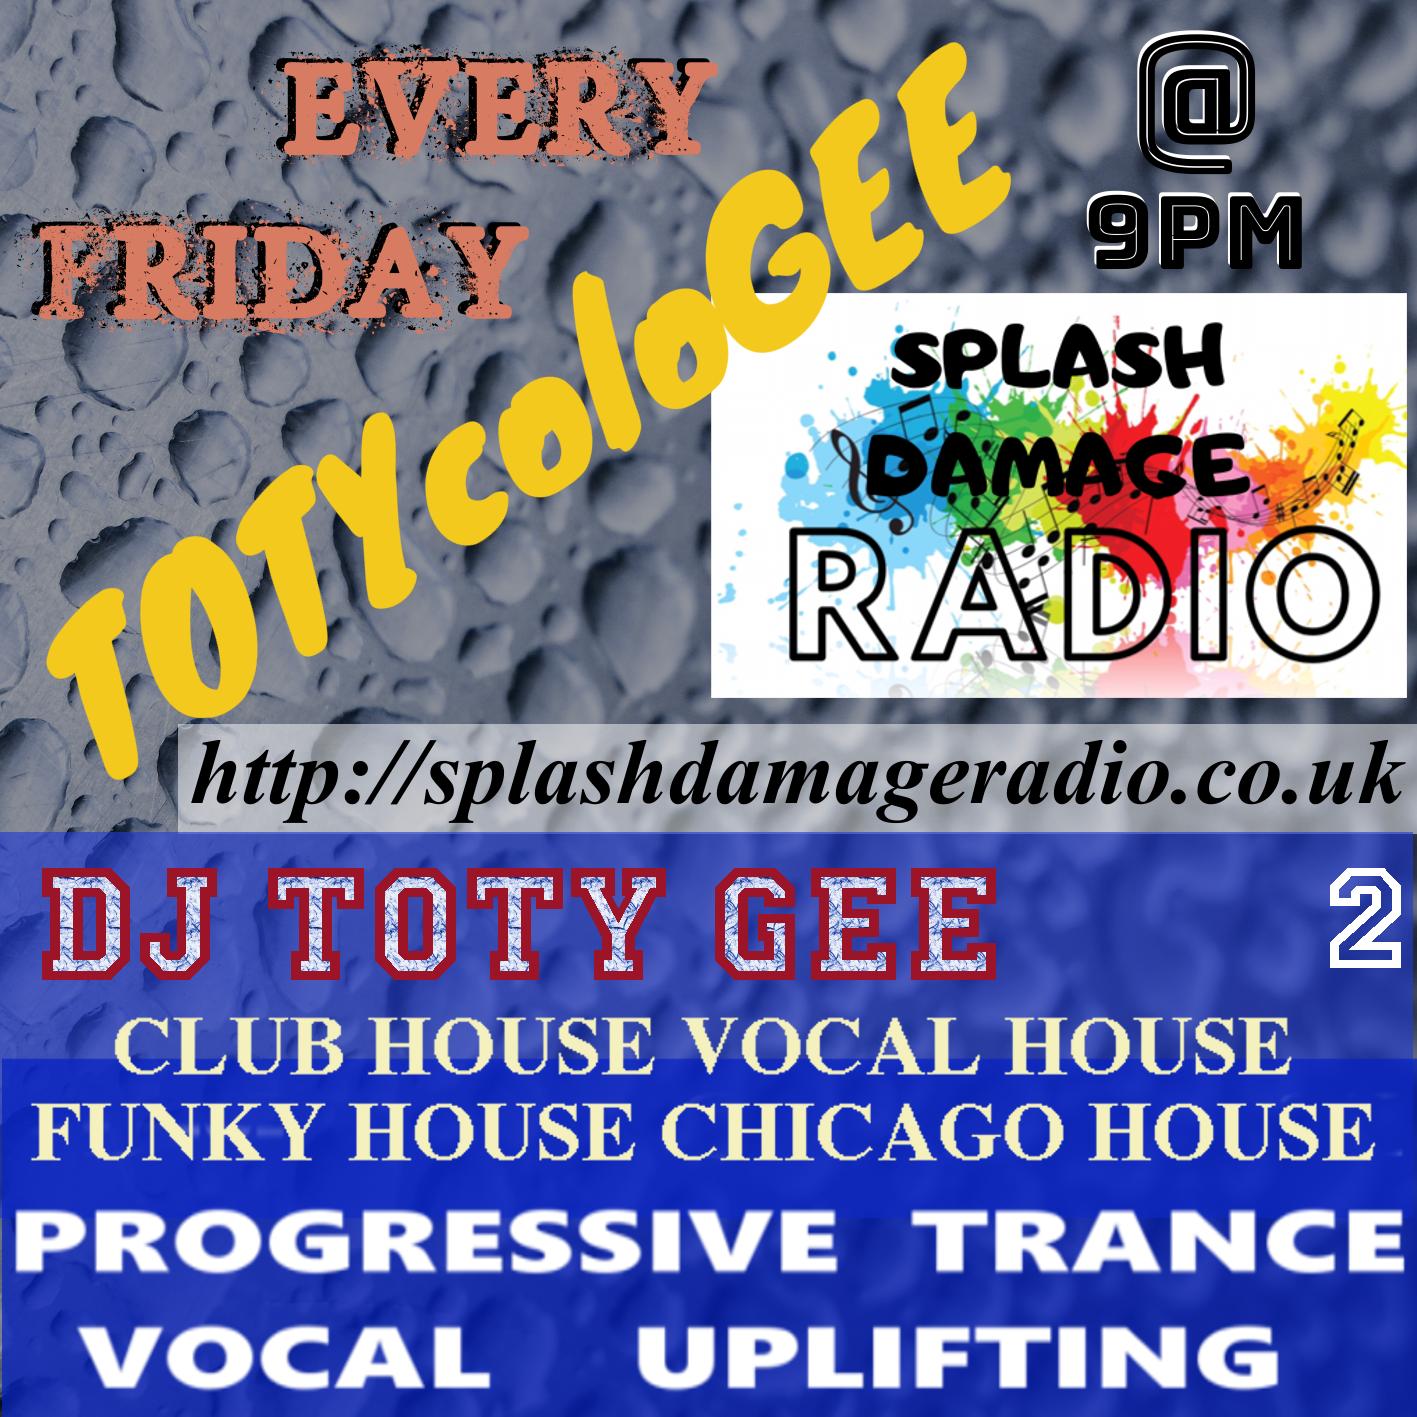 TOTYcoloGEE on SplashDamageRadio ep. 02